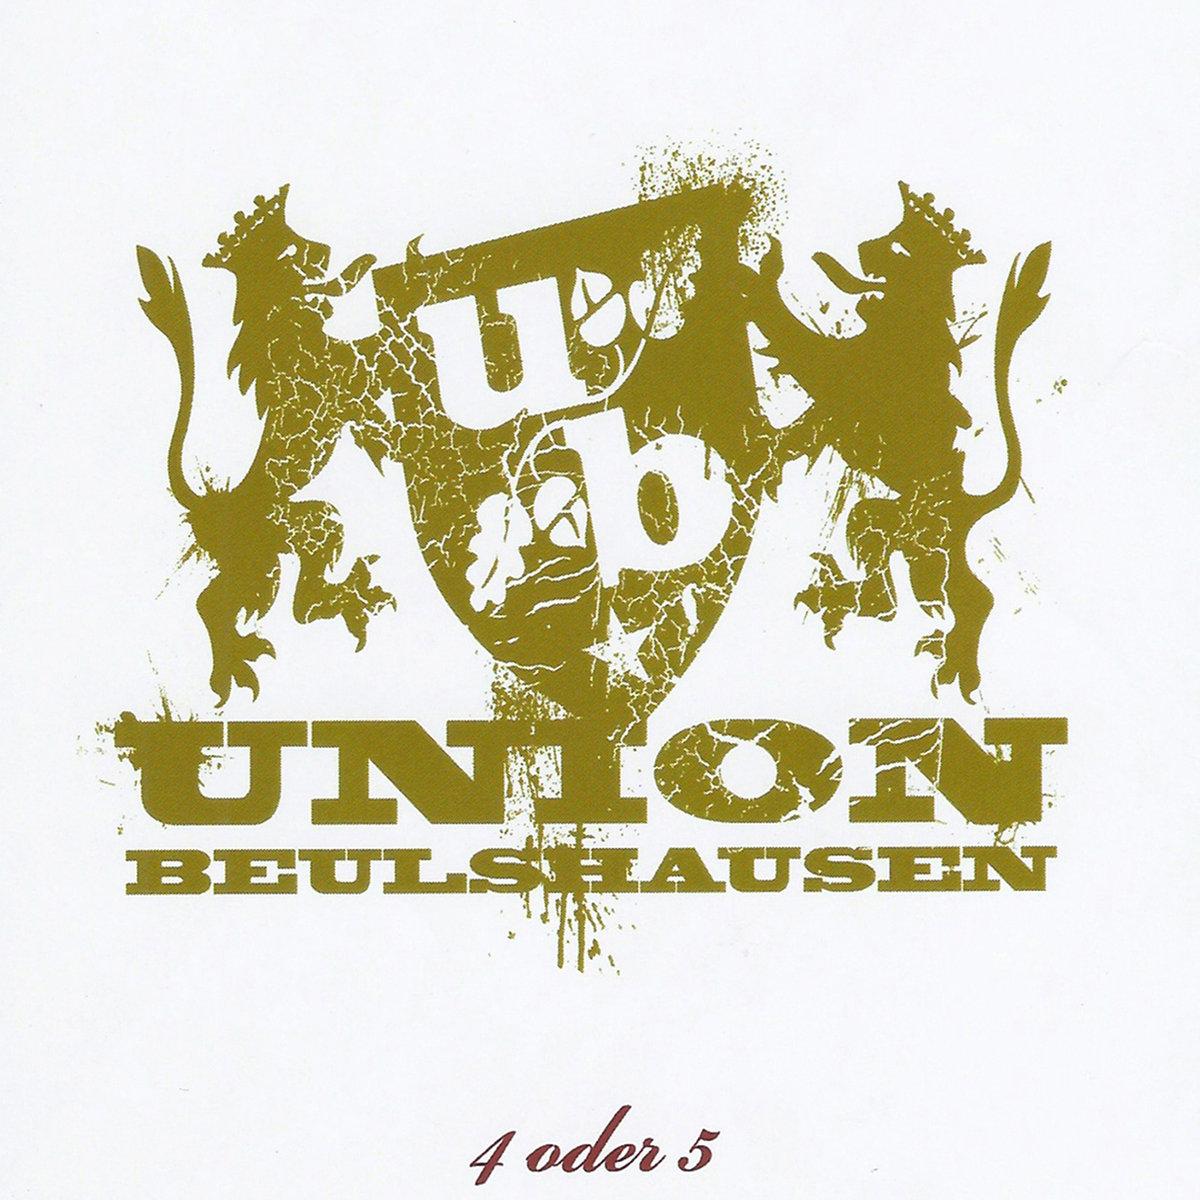 Union Beulshausen - 4 oder 5